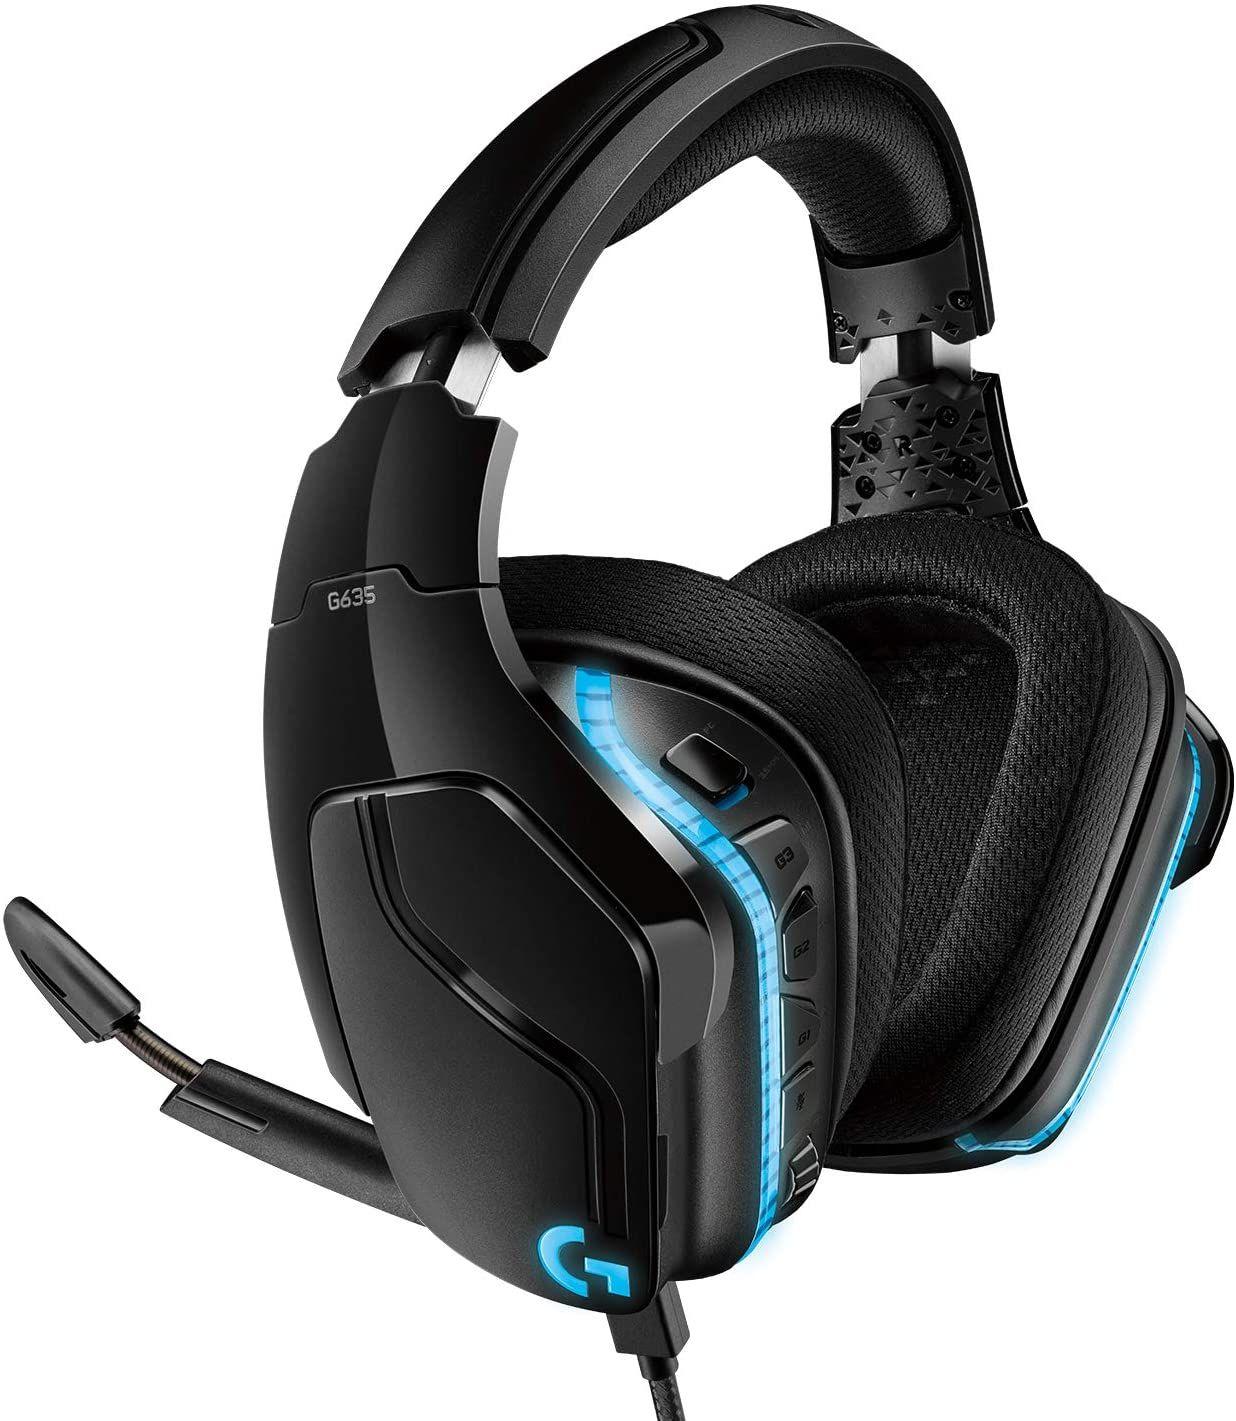 Logitech G635 7.1 Lightsync Gaming Headset @Amazon FR